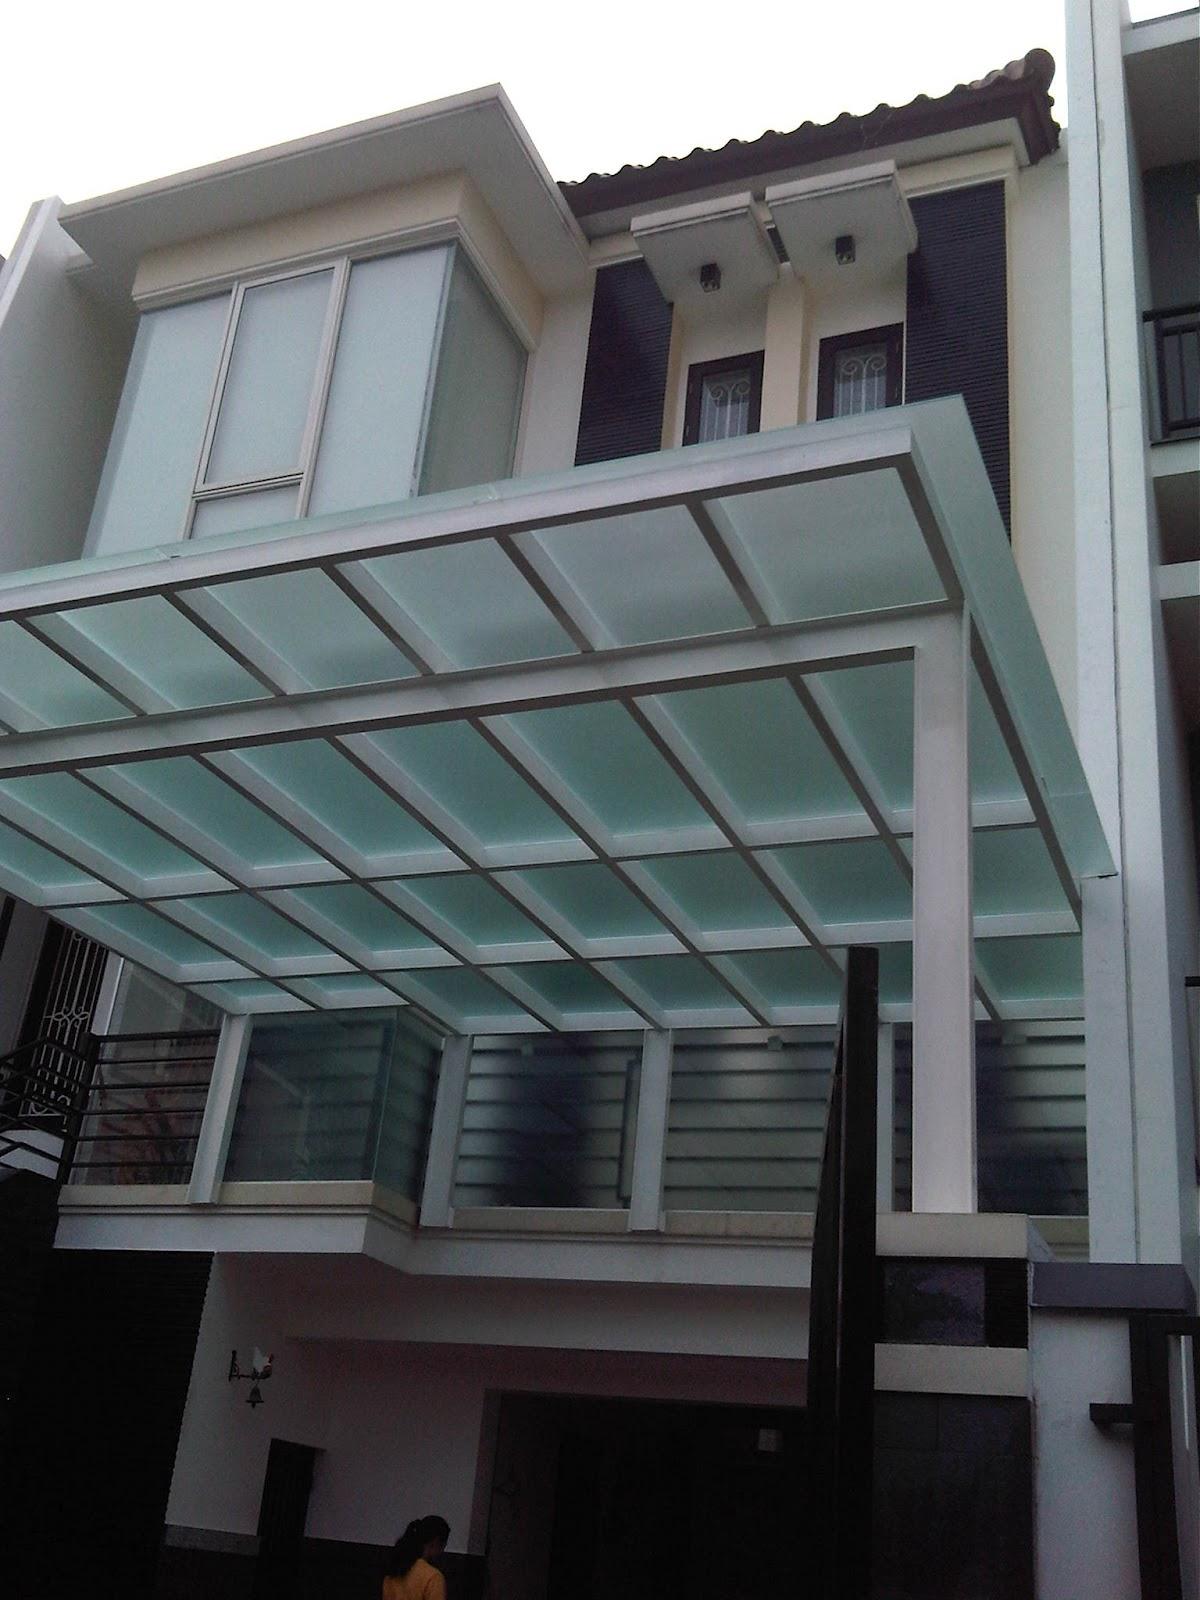 Satmatindo Glass Canopy Kaca Tempered Kanopi Kaca